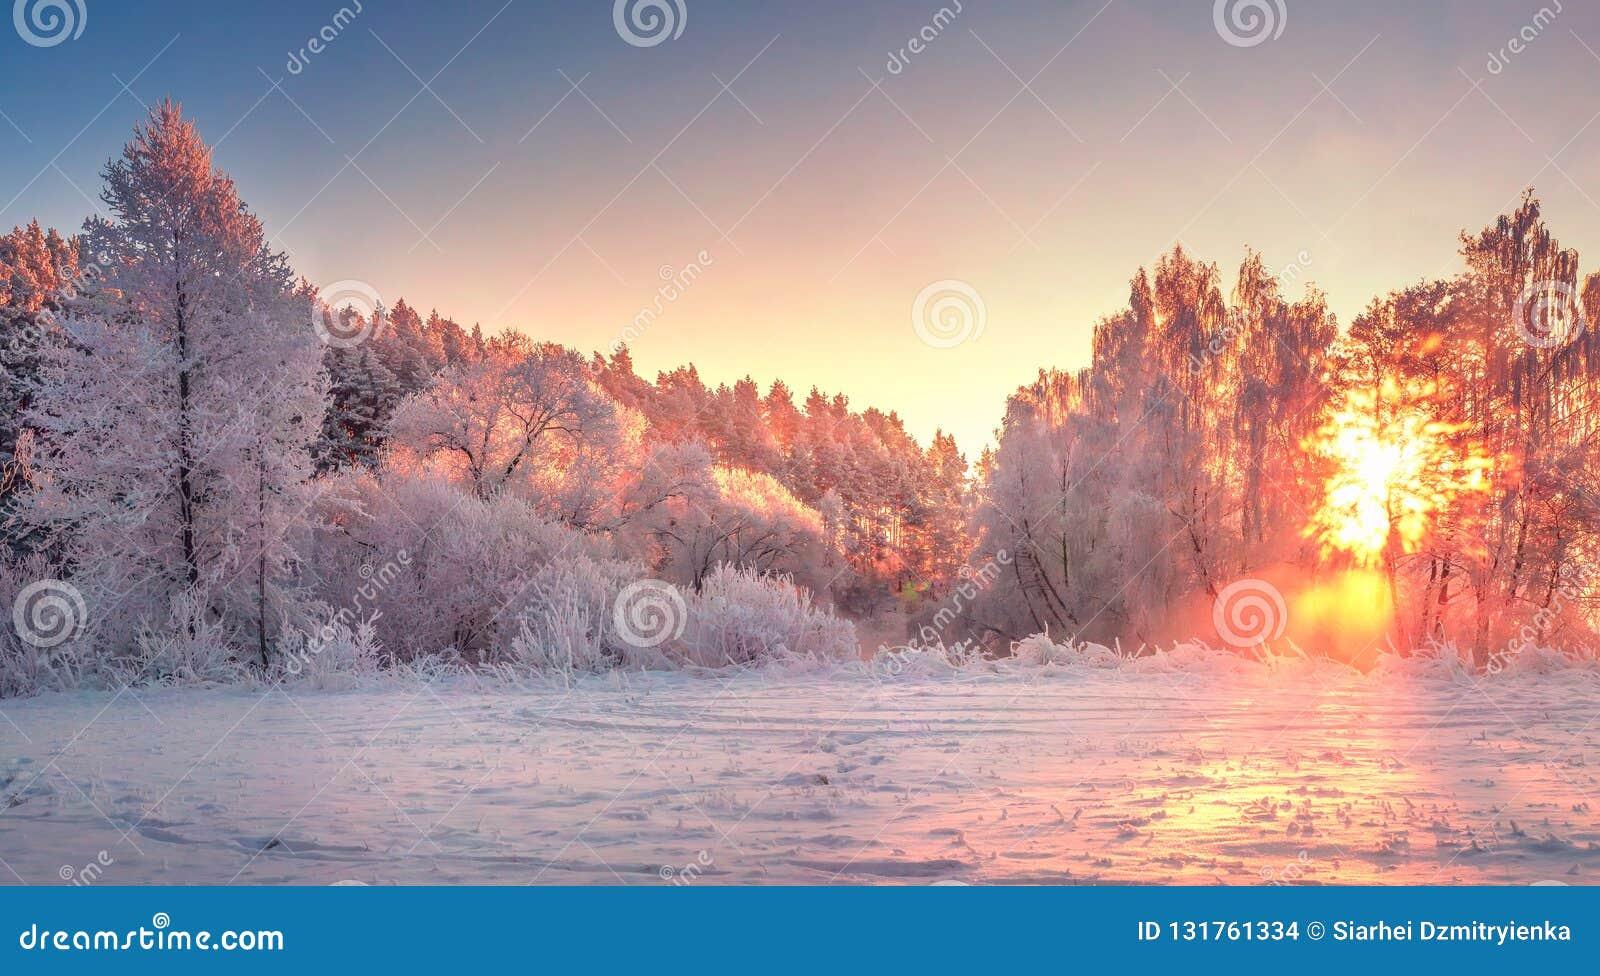 Winter morning landscape sunrise